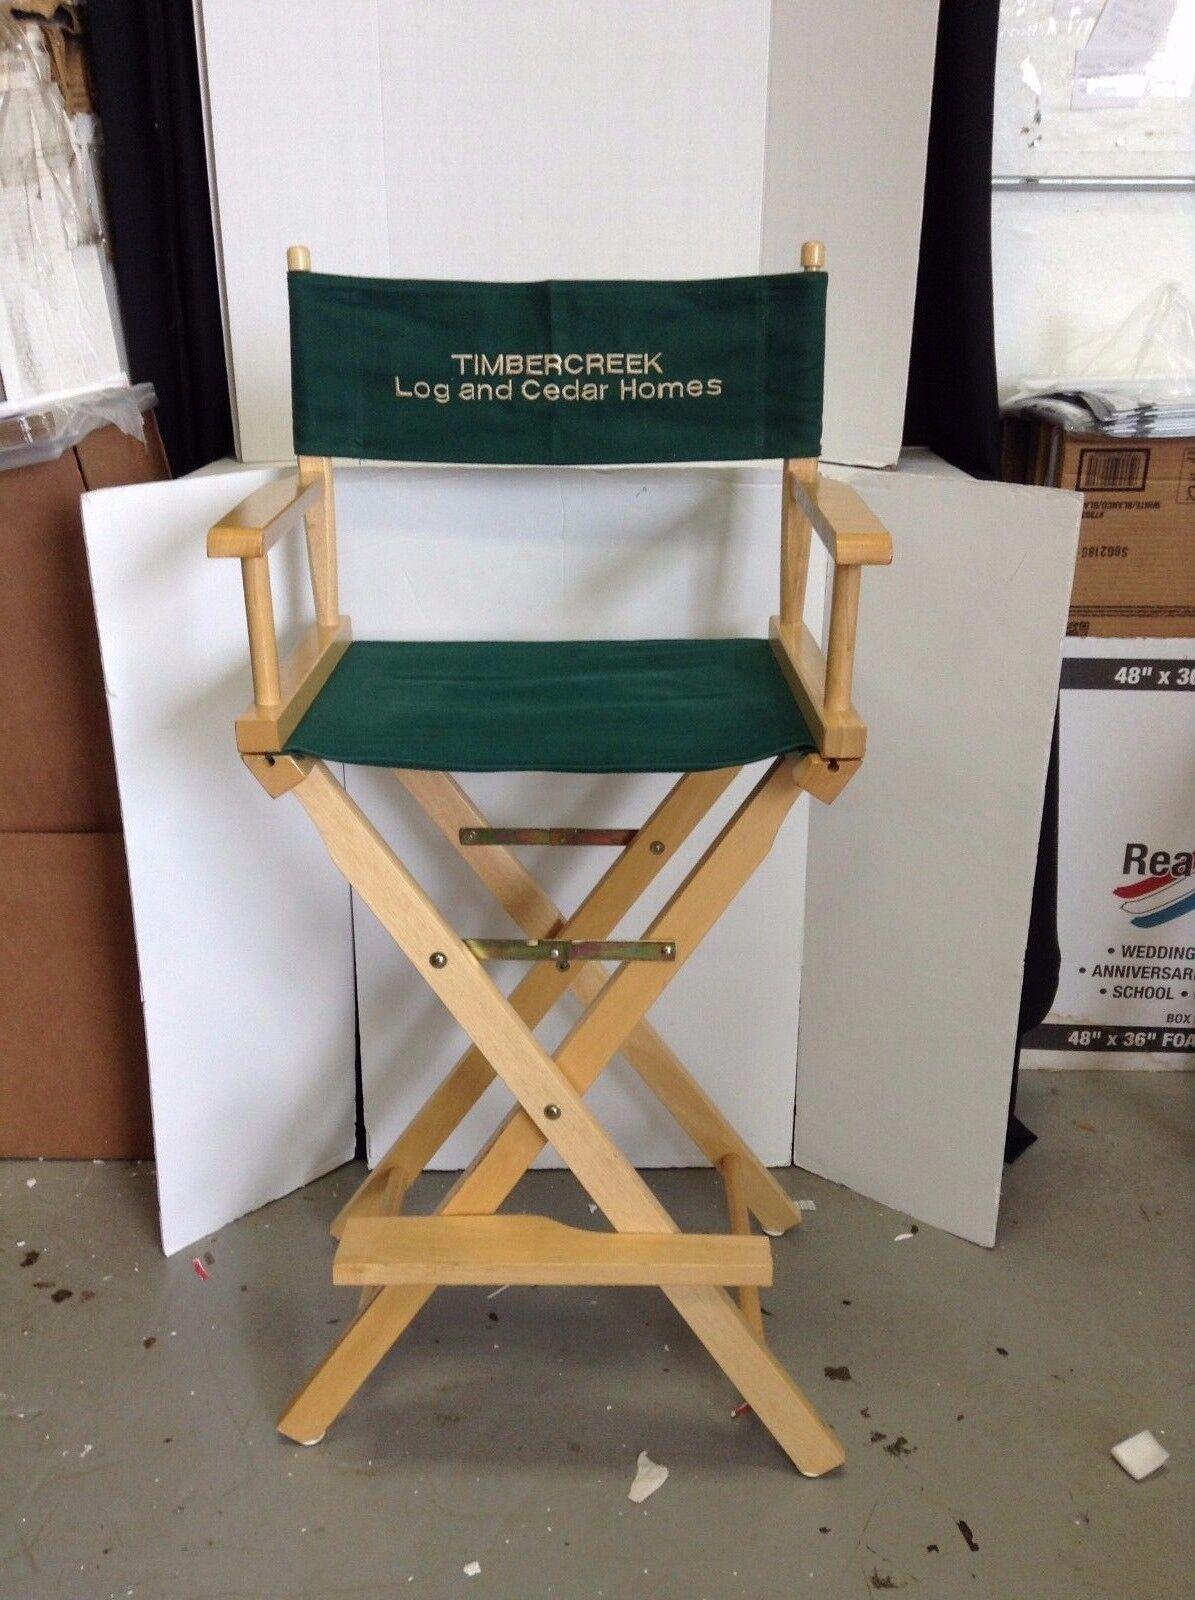 2 Barras De Fiesta Plegable Timbercreek Maquillaje Cabello Portátil 44  silla de director de la película